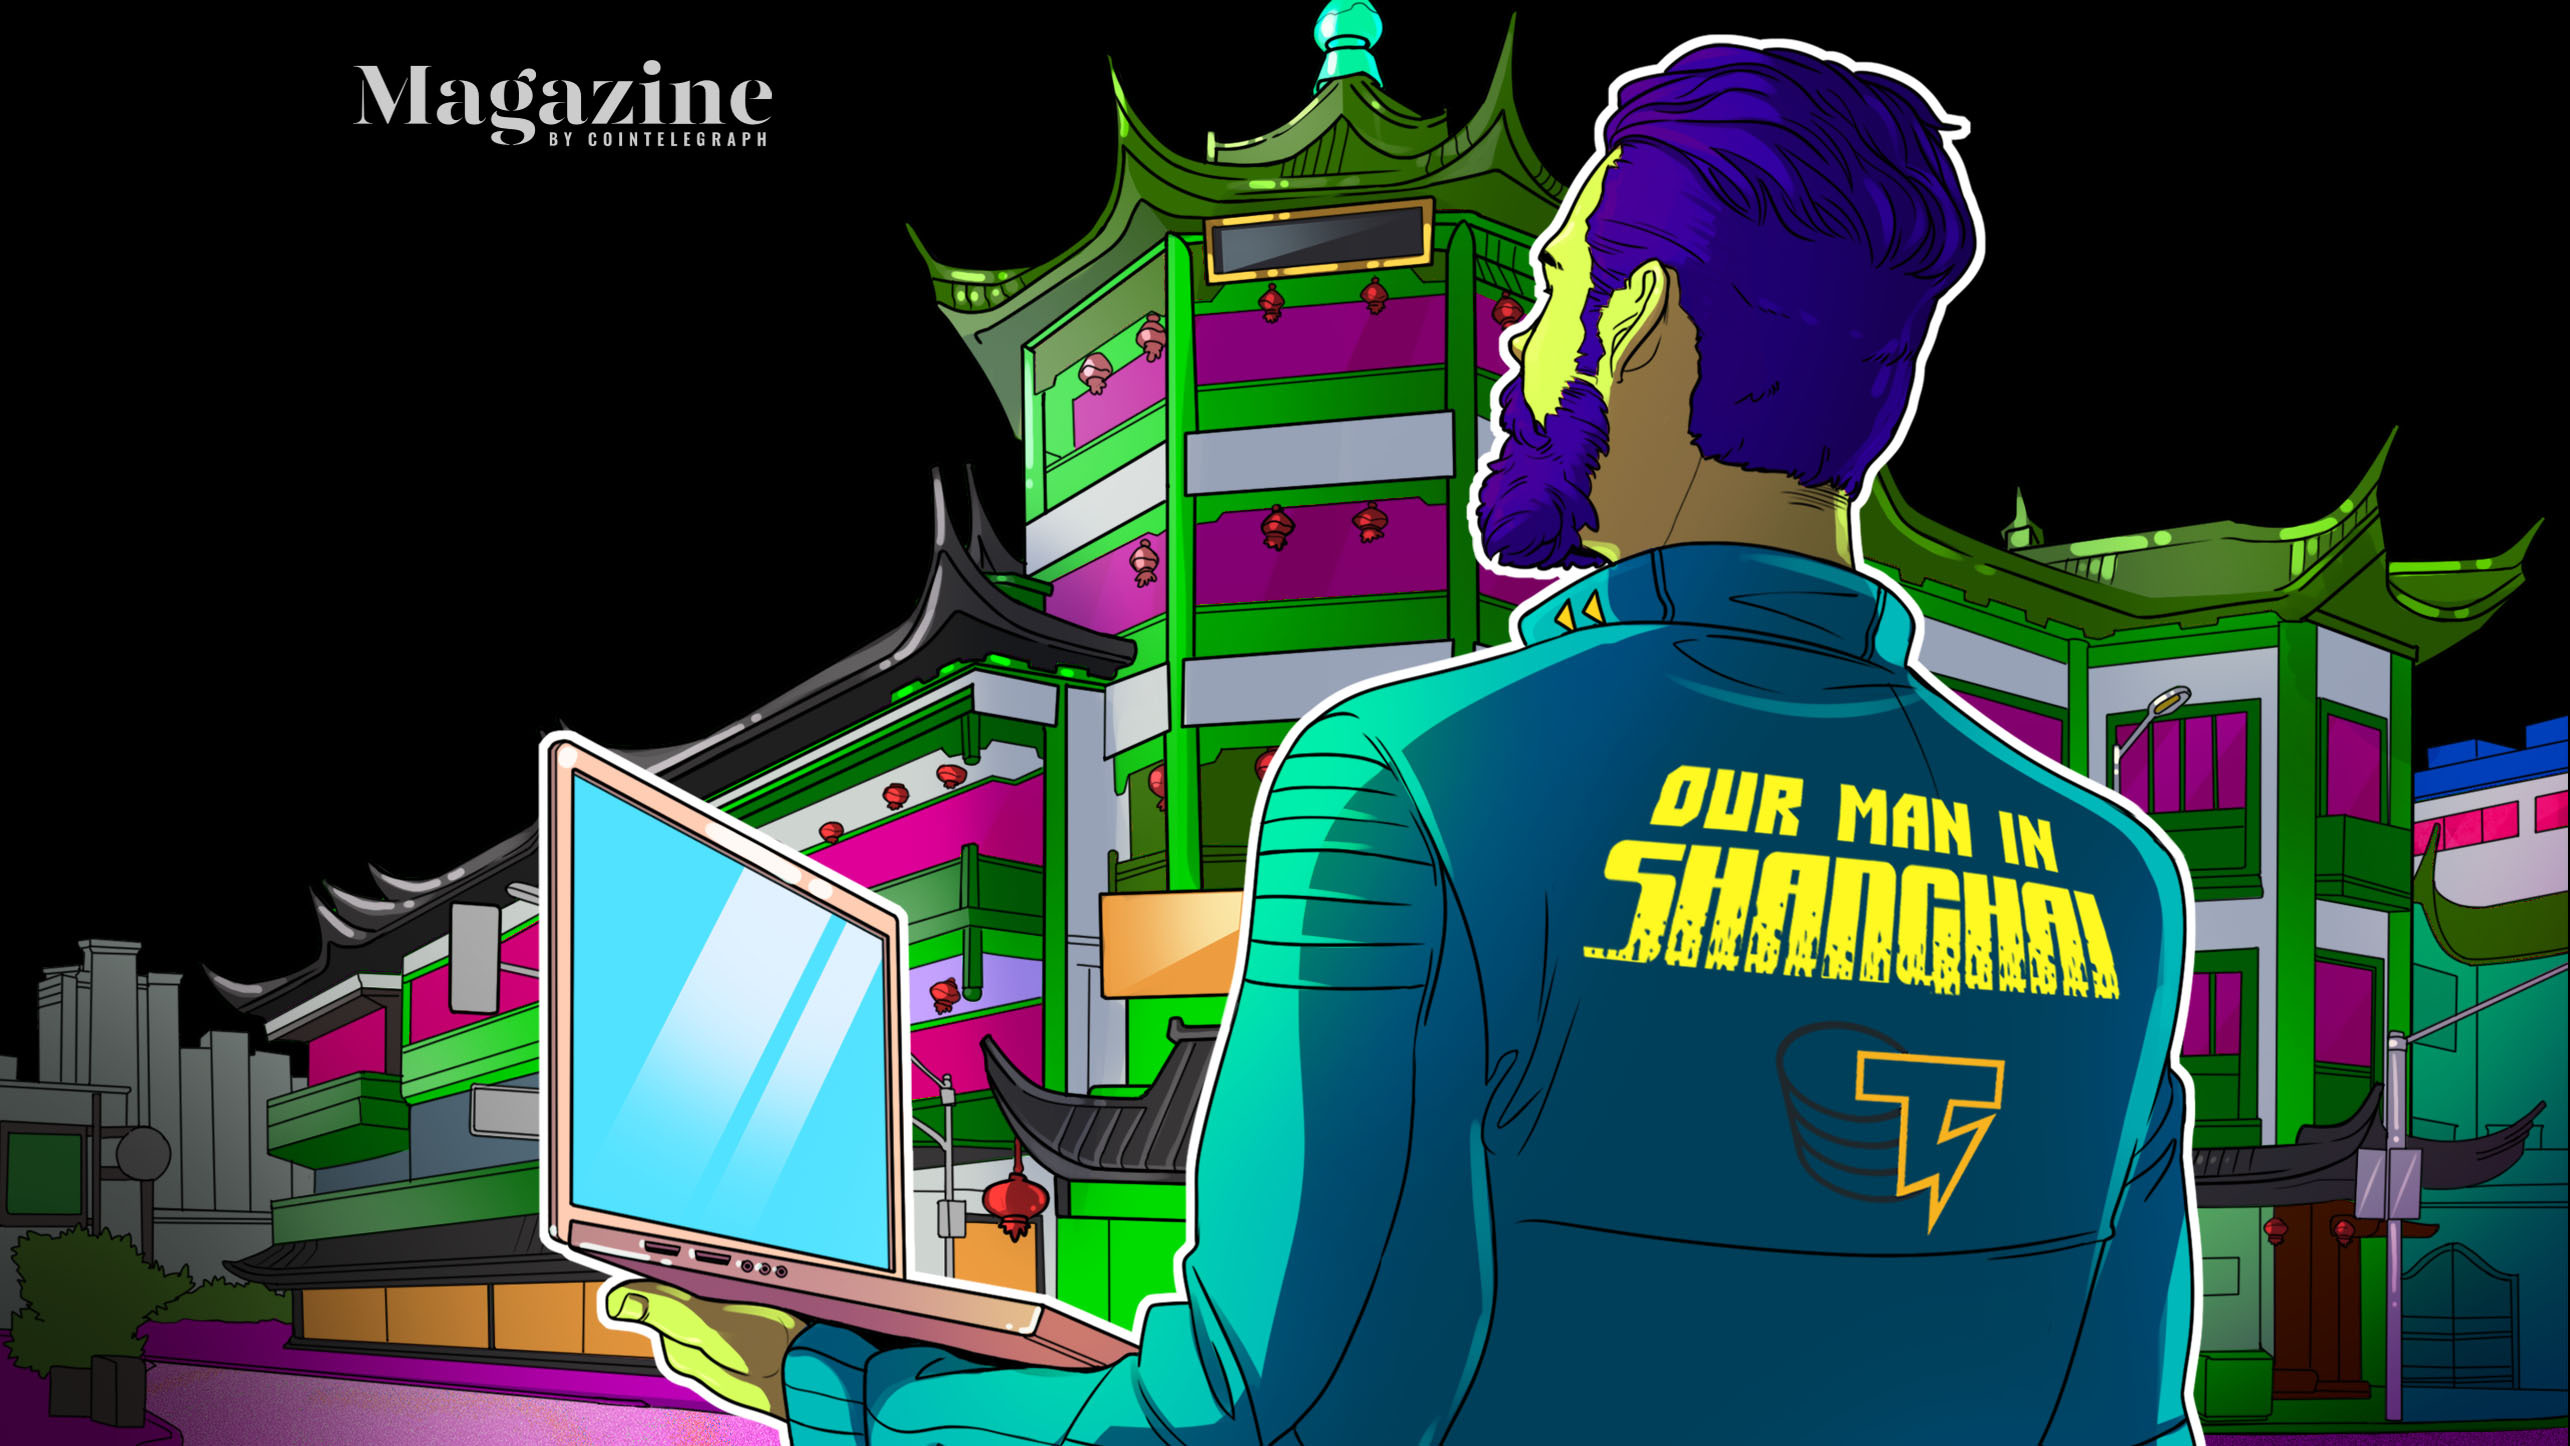 US senators tell athletes to avoid digital yuan, Chinese exchange volumes rebound ... and more – Cointelegraph Magazine